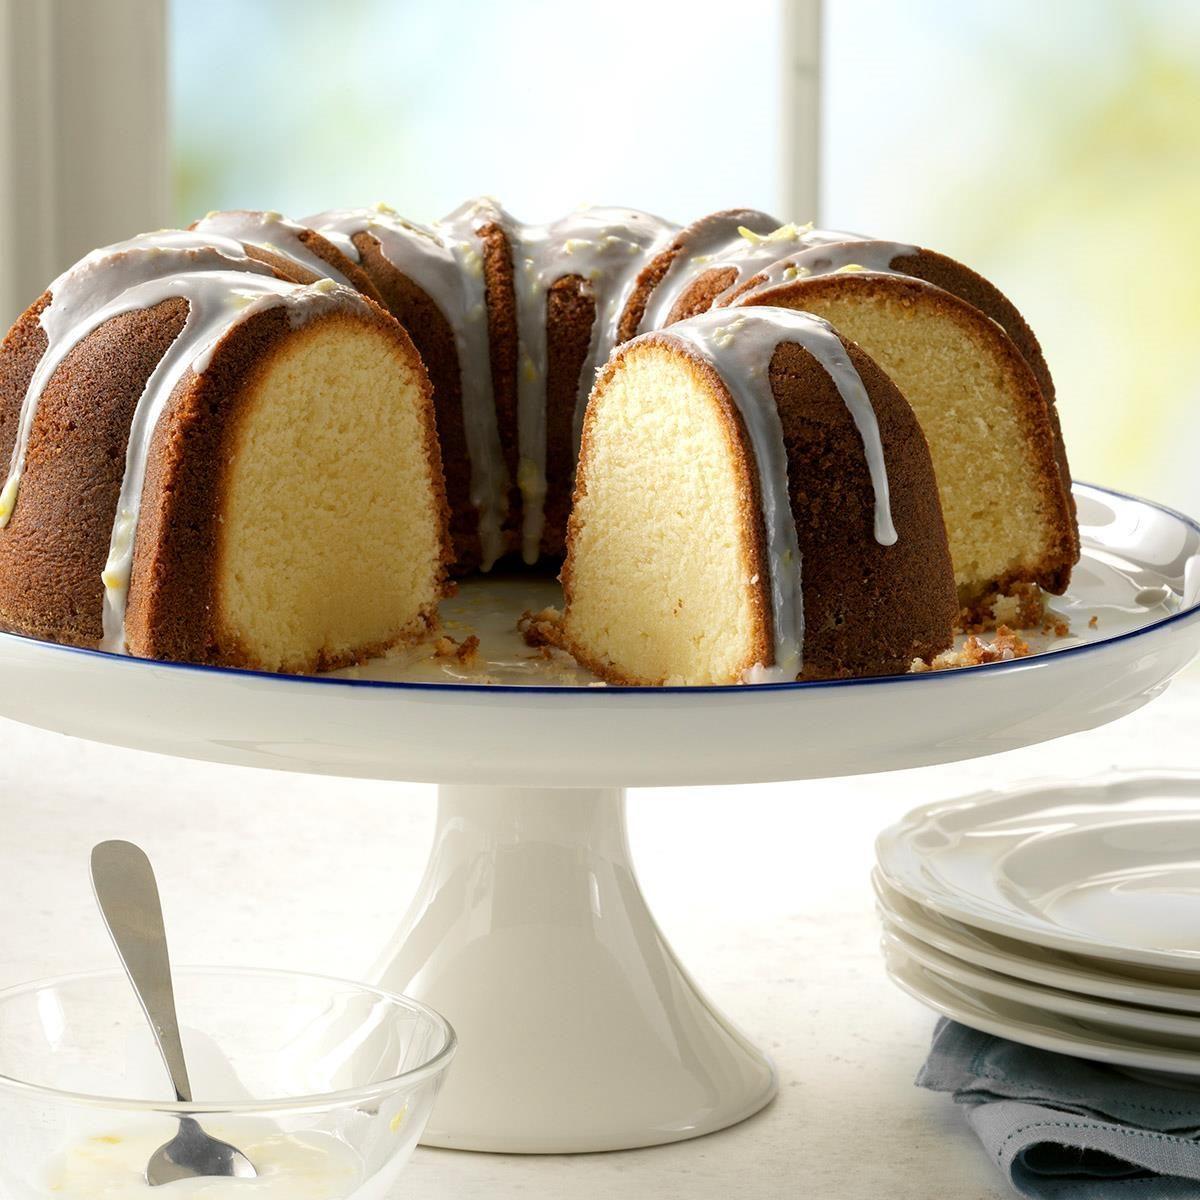 1977: 7-UP Cake